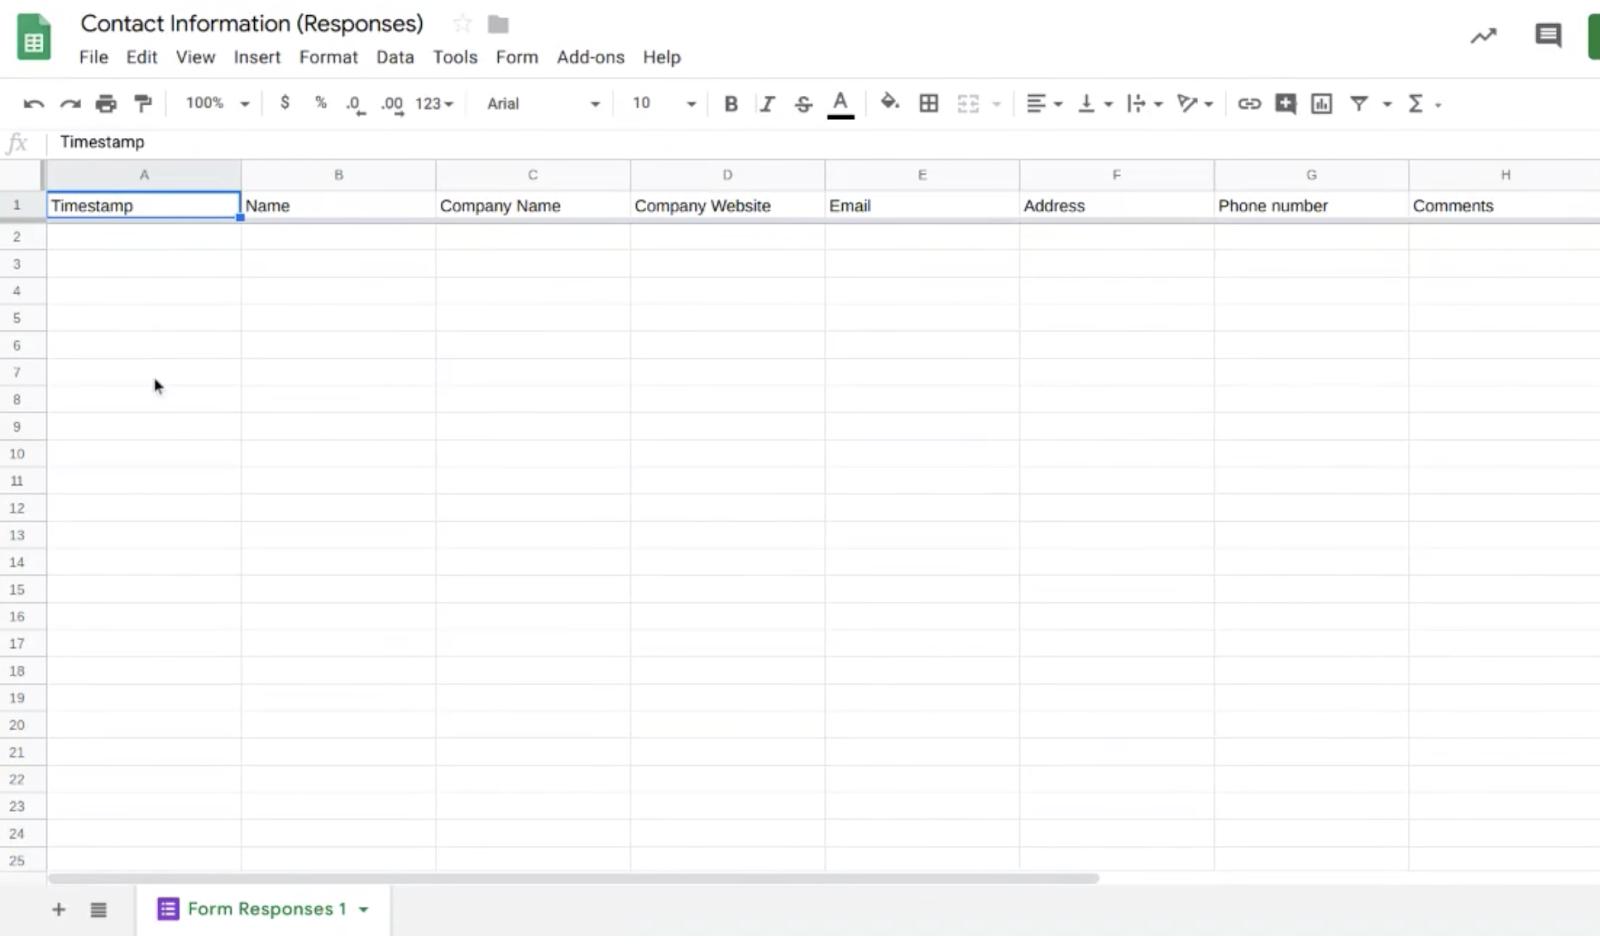 Google Sheets Contact Information Sheet